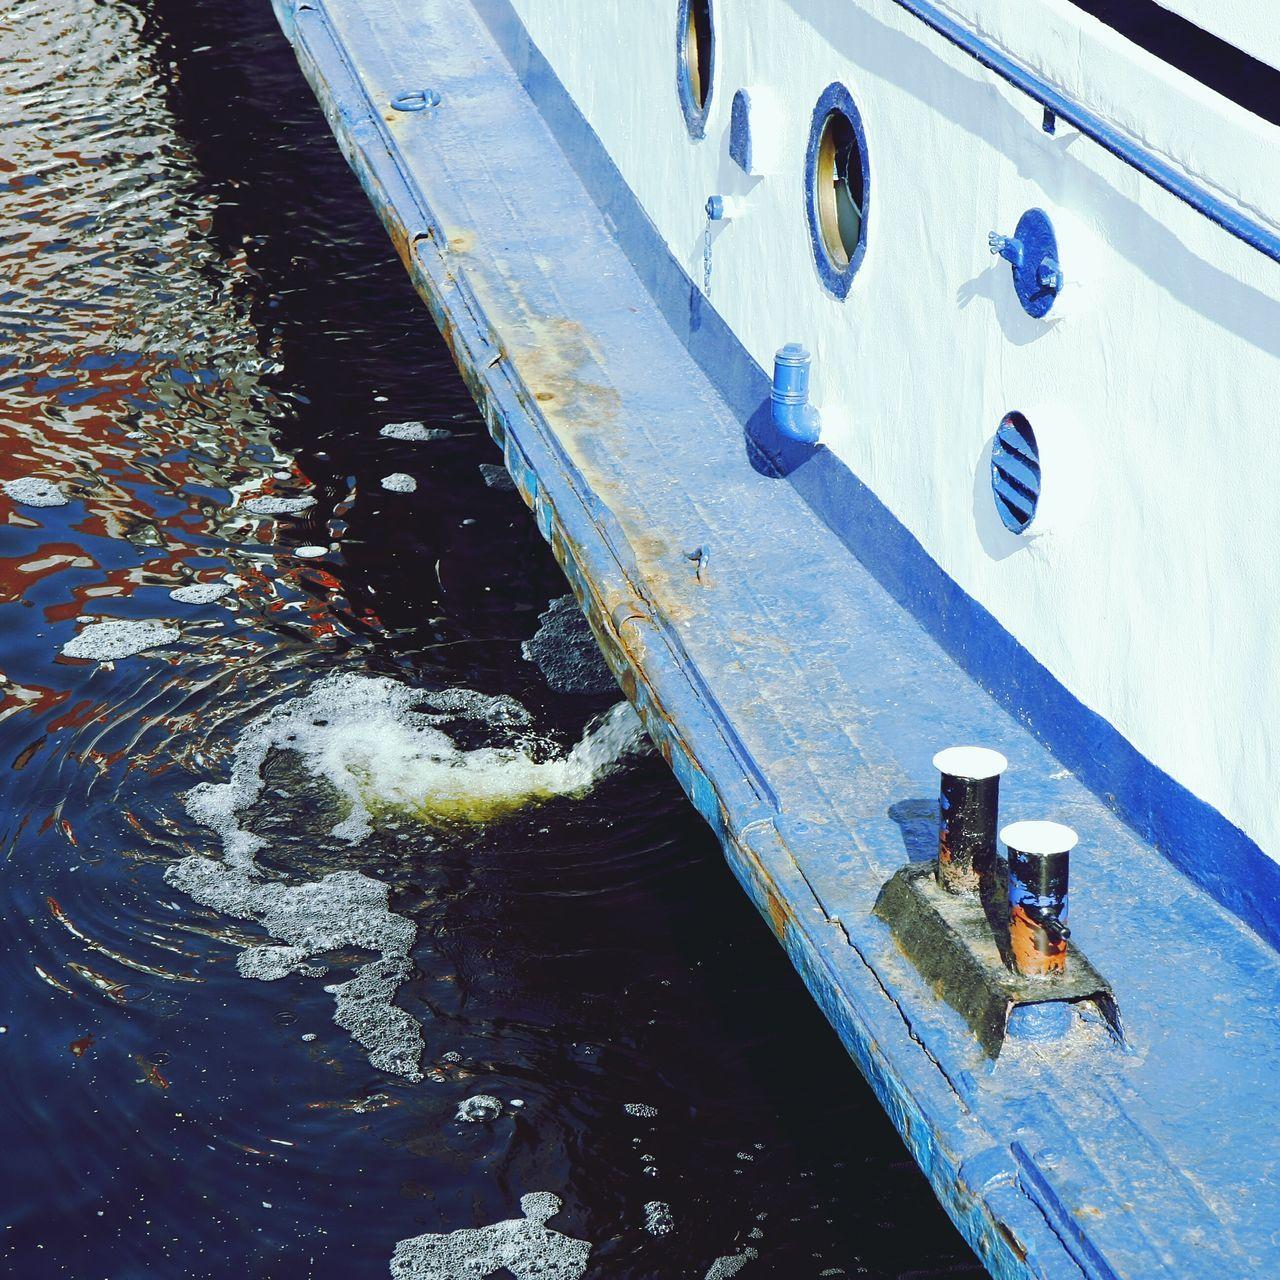 White Boat River Lake Detail EyeEm Best Shots